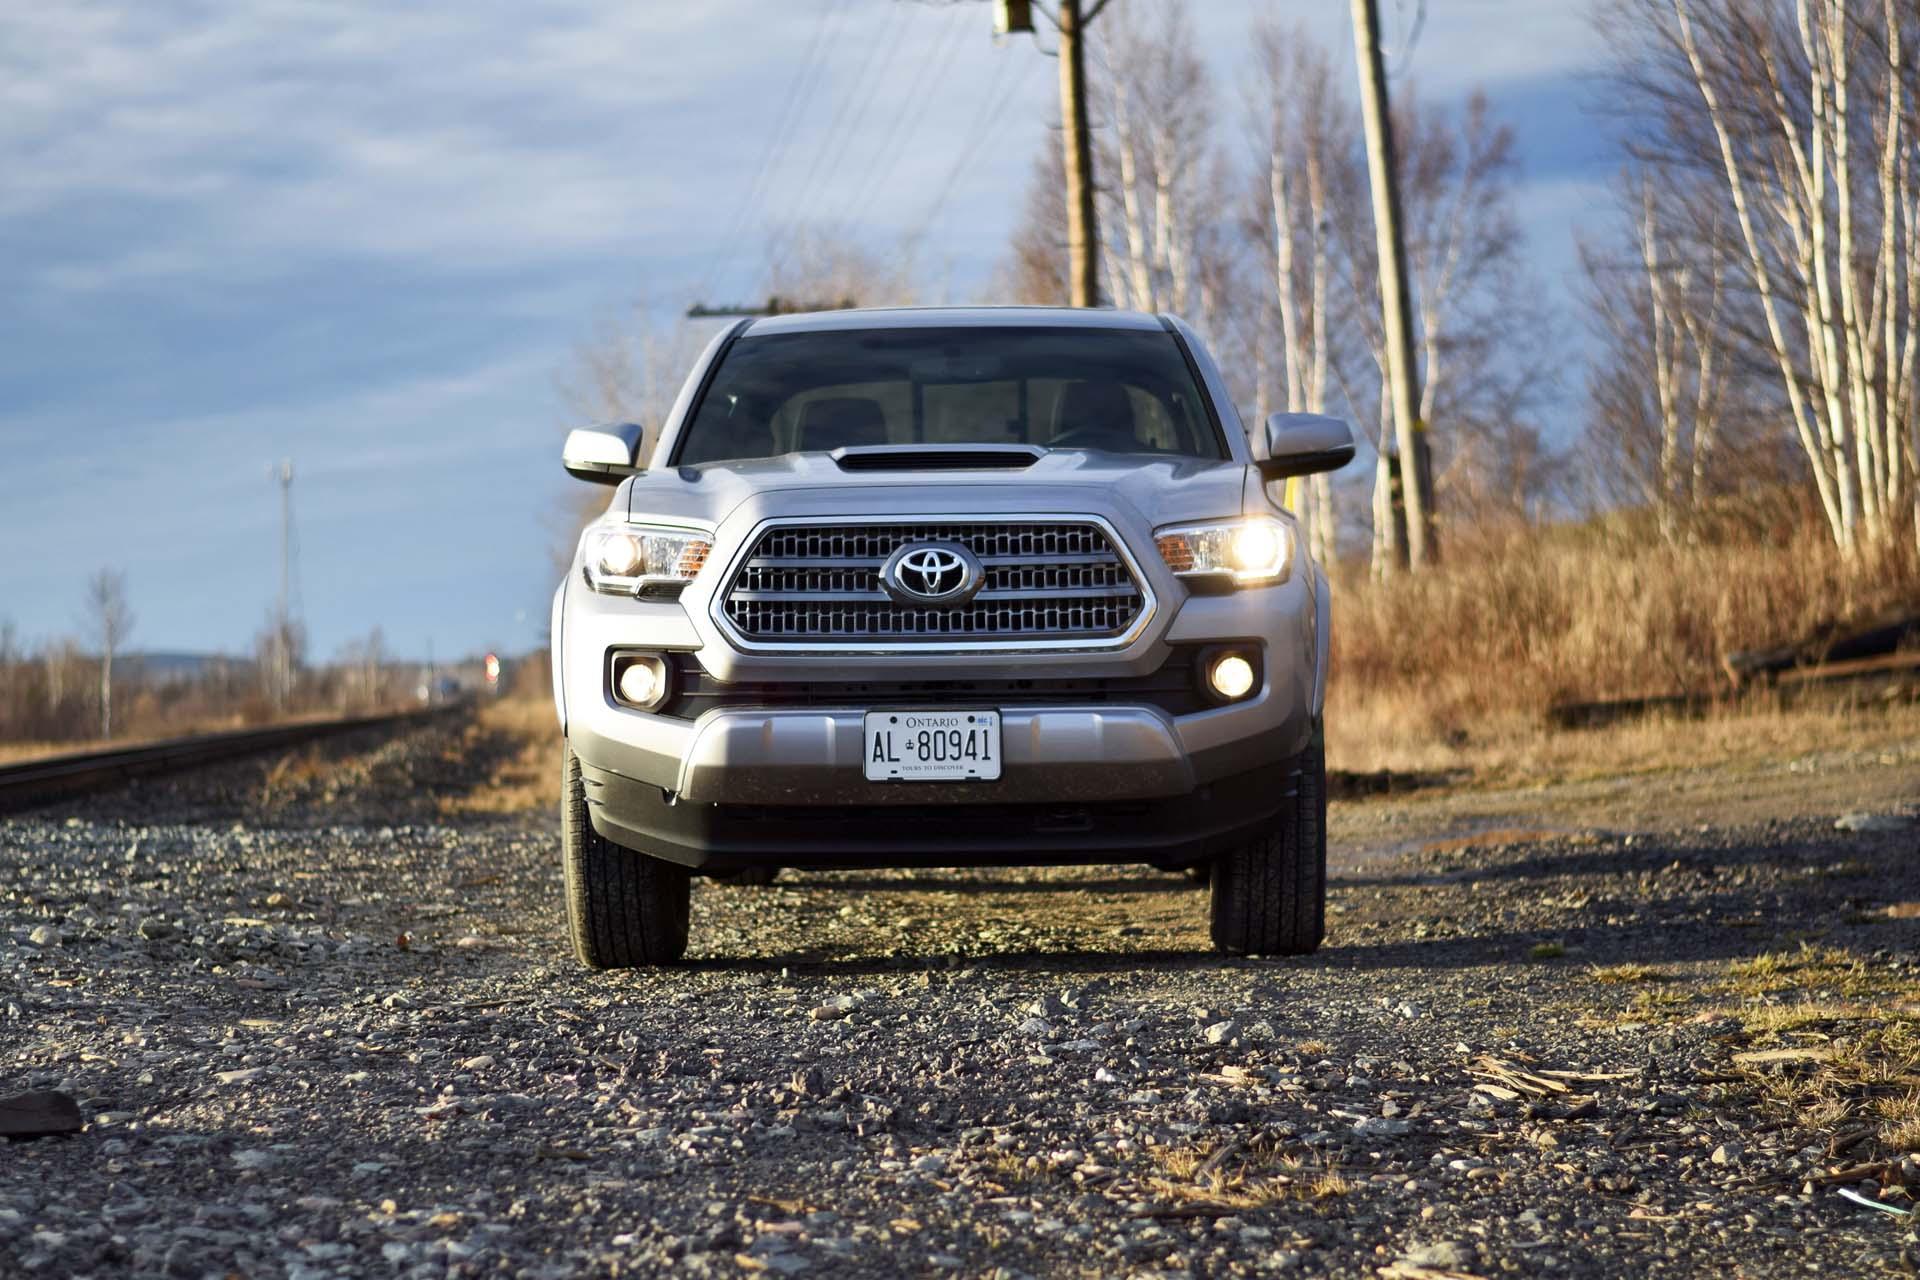 Toyota Tacoma 2015-2018 Service Manual: Instrument Panel Safety Pad